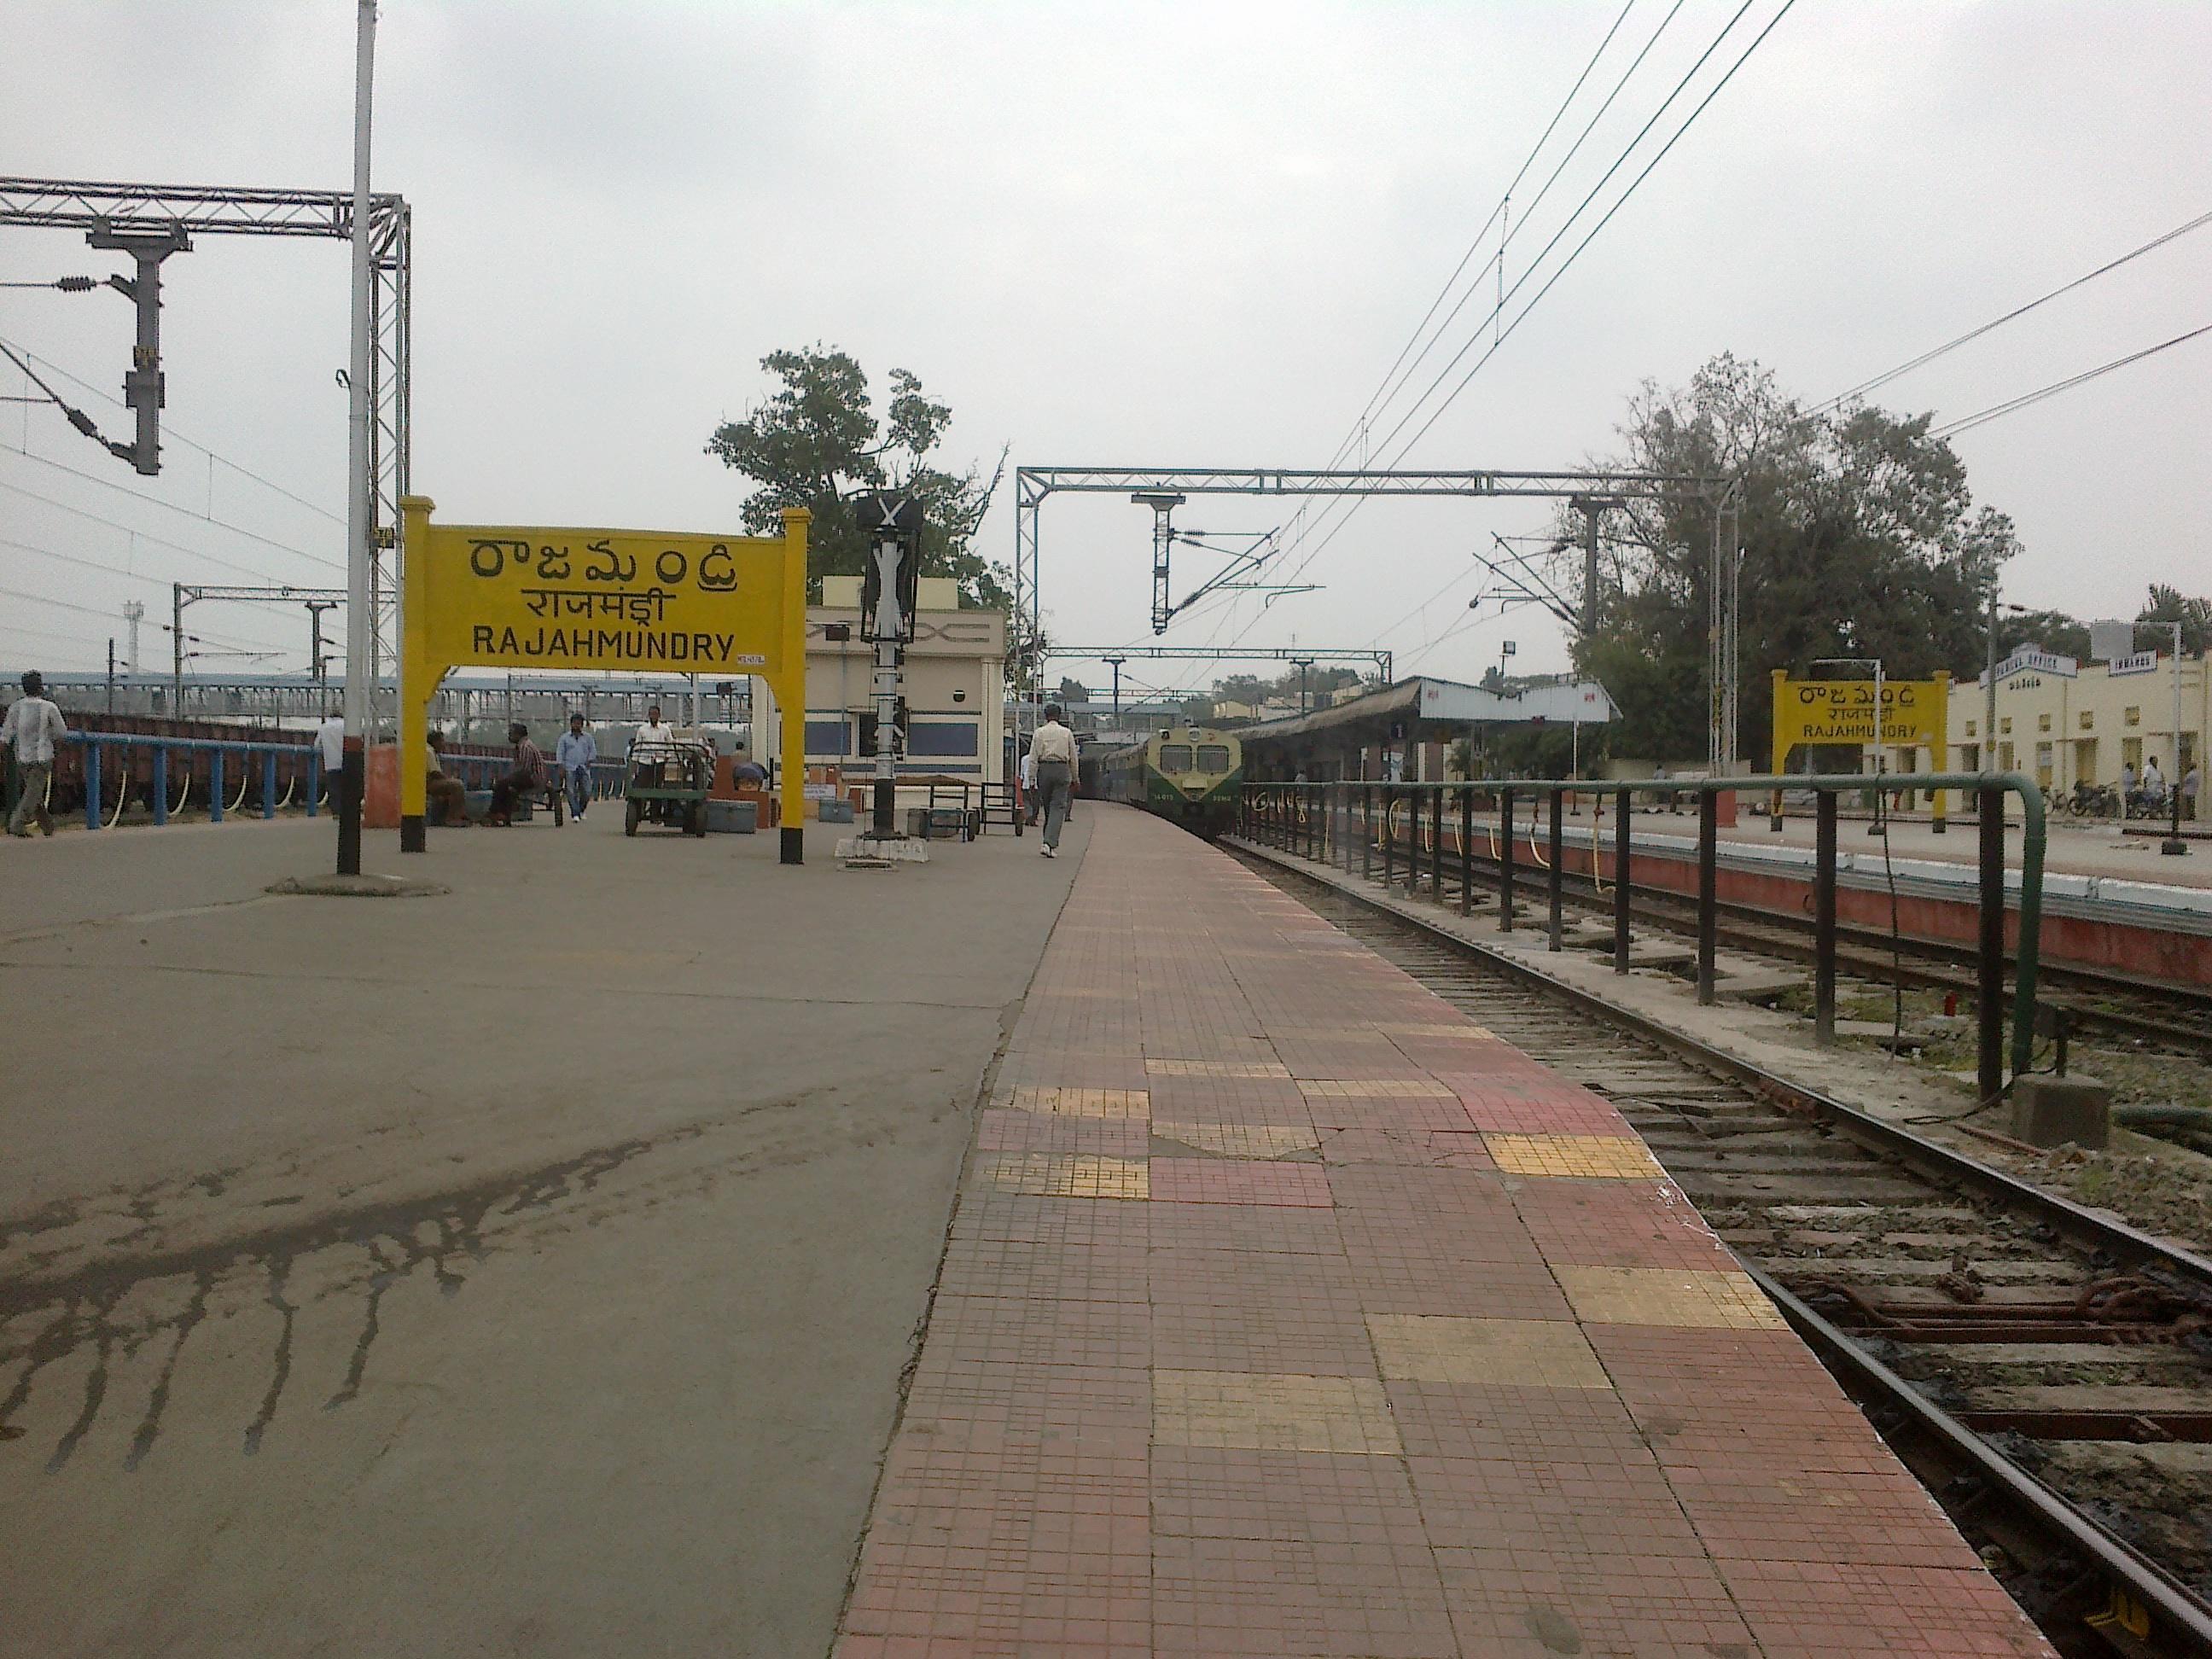 d3ae747ef File:Rajahmundry Railway Station,Platform 1 to the right,Platform 3 to the  left and platform 2 at the Centre.jpg